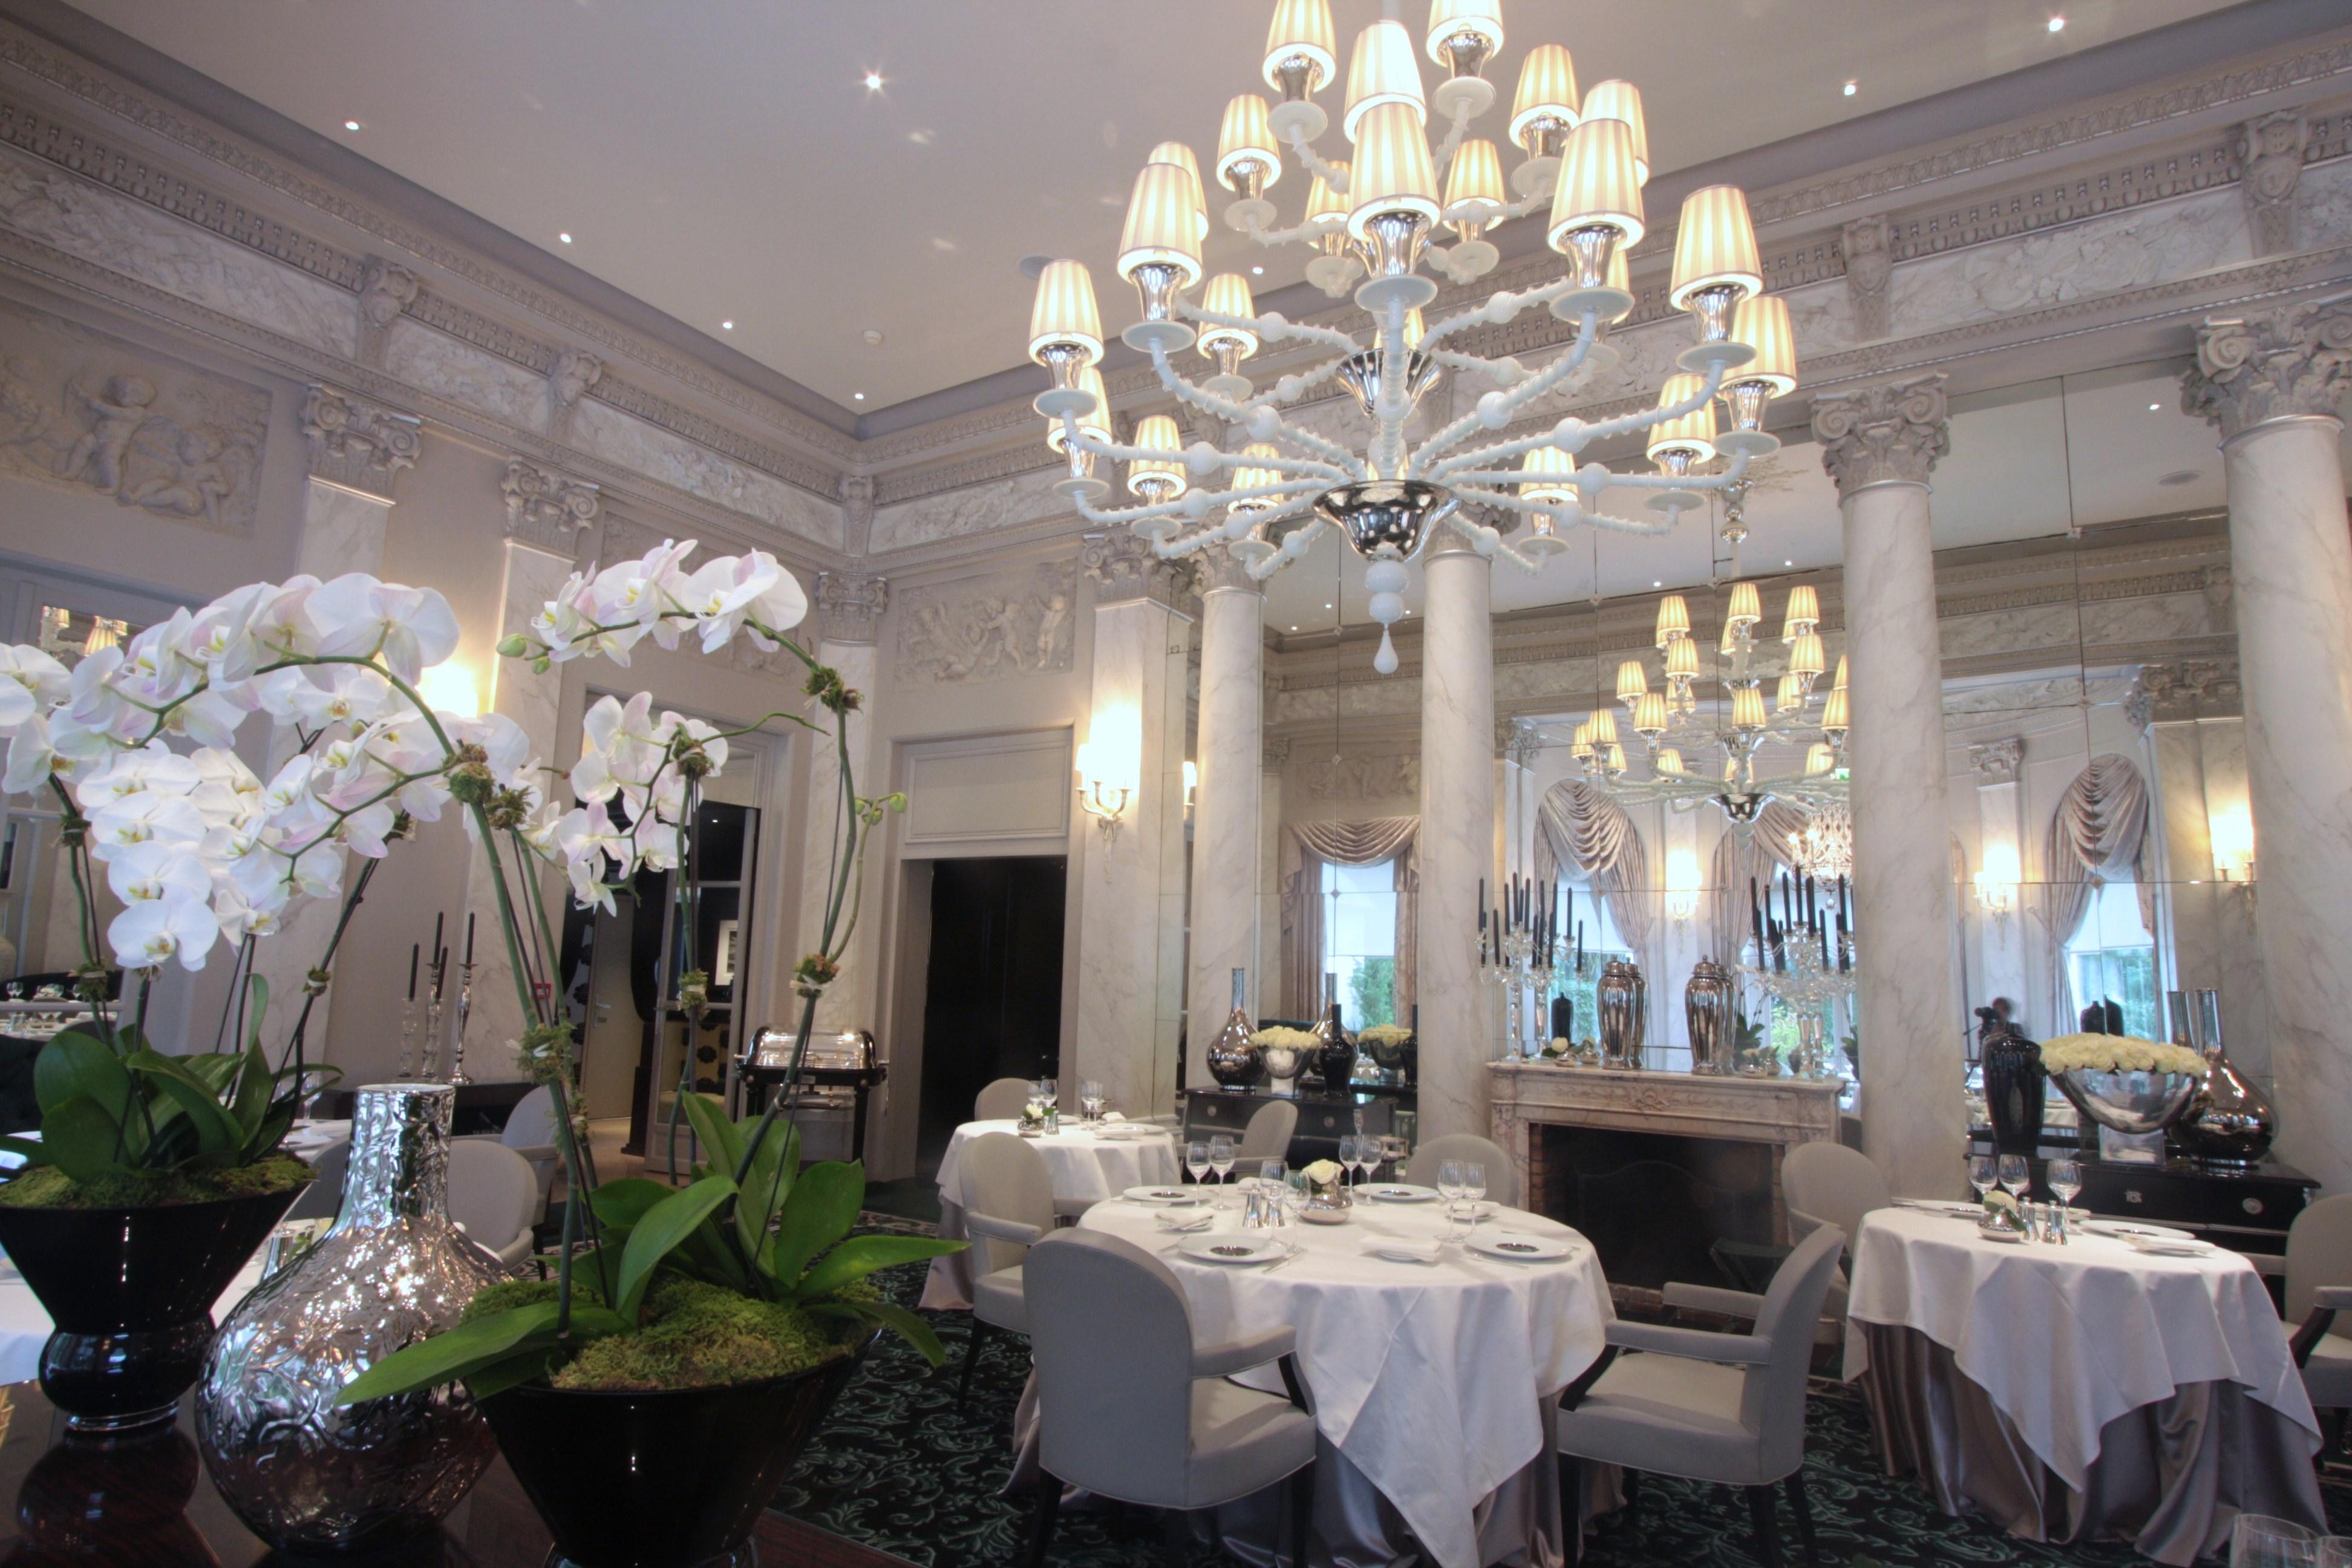 precatelan-restaurant-pierre-yves-rochon-veronese-1